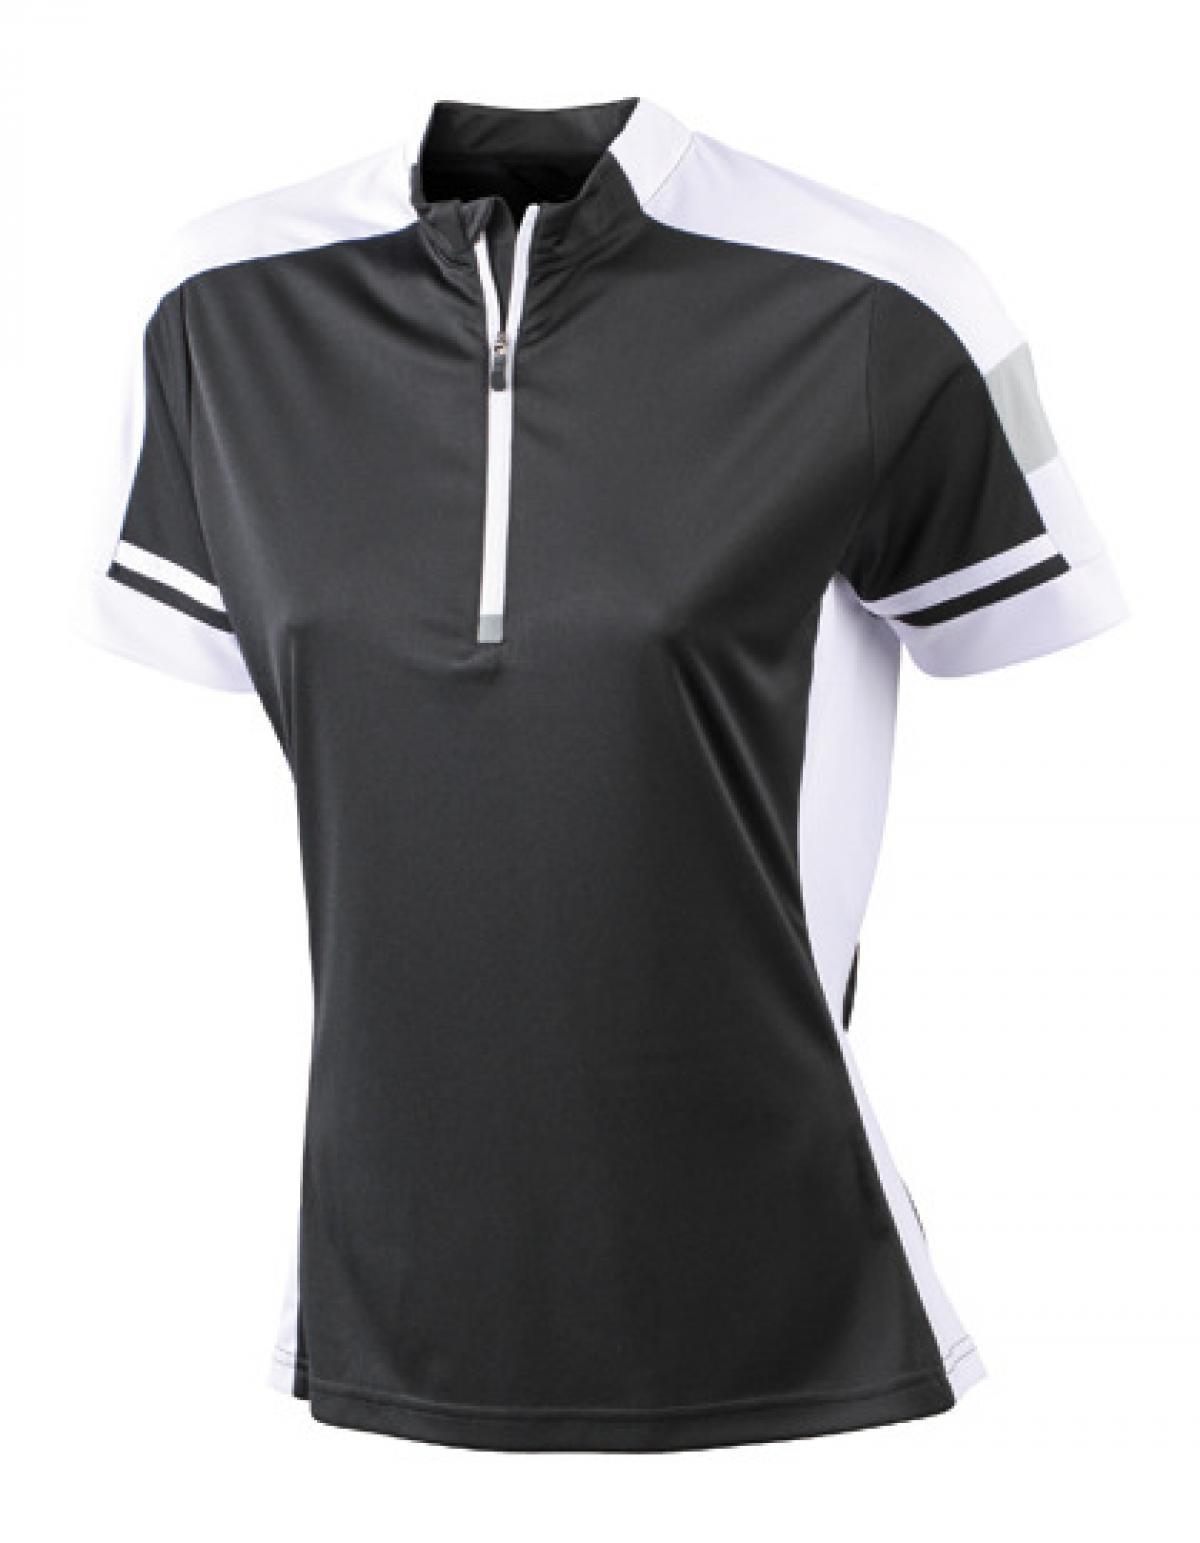 damen bike und sport t shirt rei verschluss mit kinnschutz james. Black Bedroom Furniture Sets. Home Design Ideas